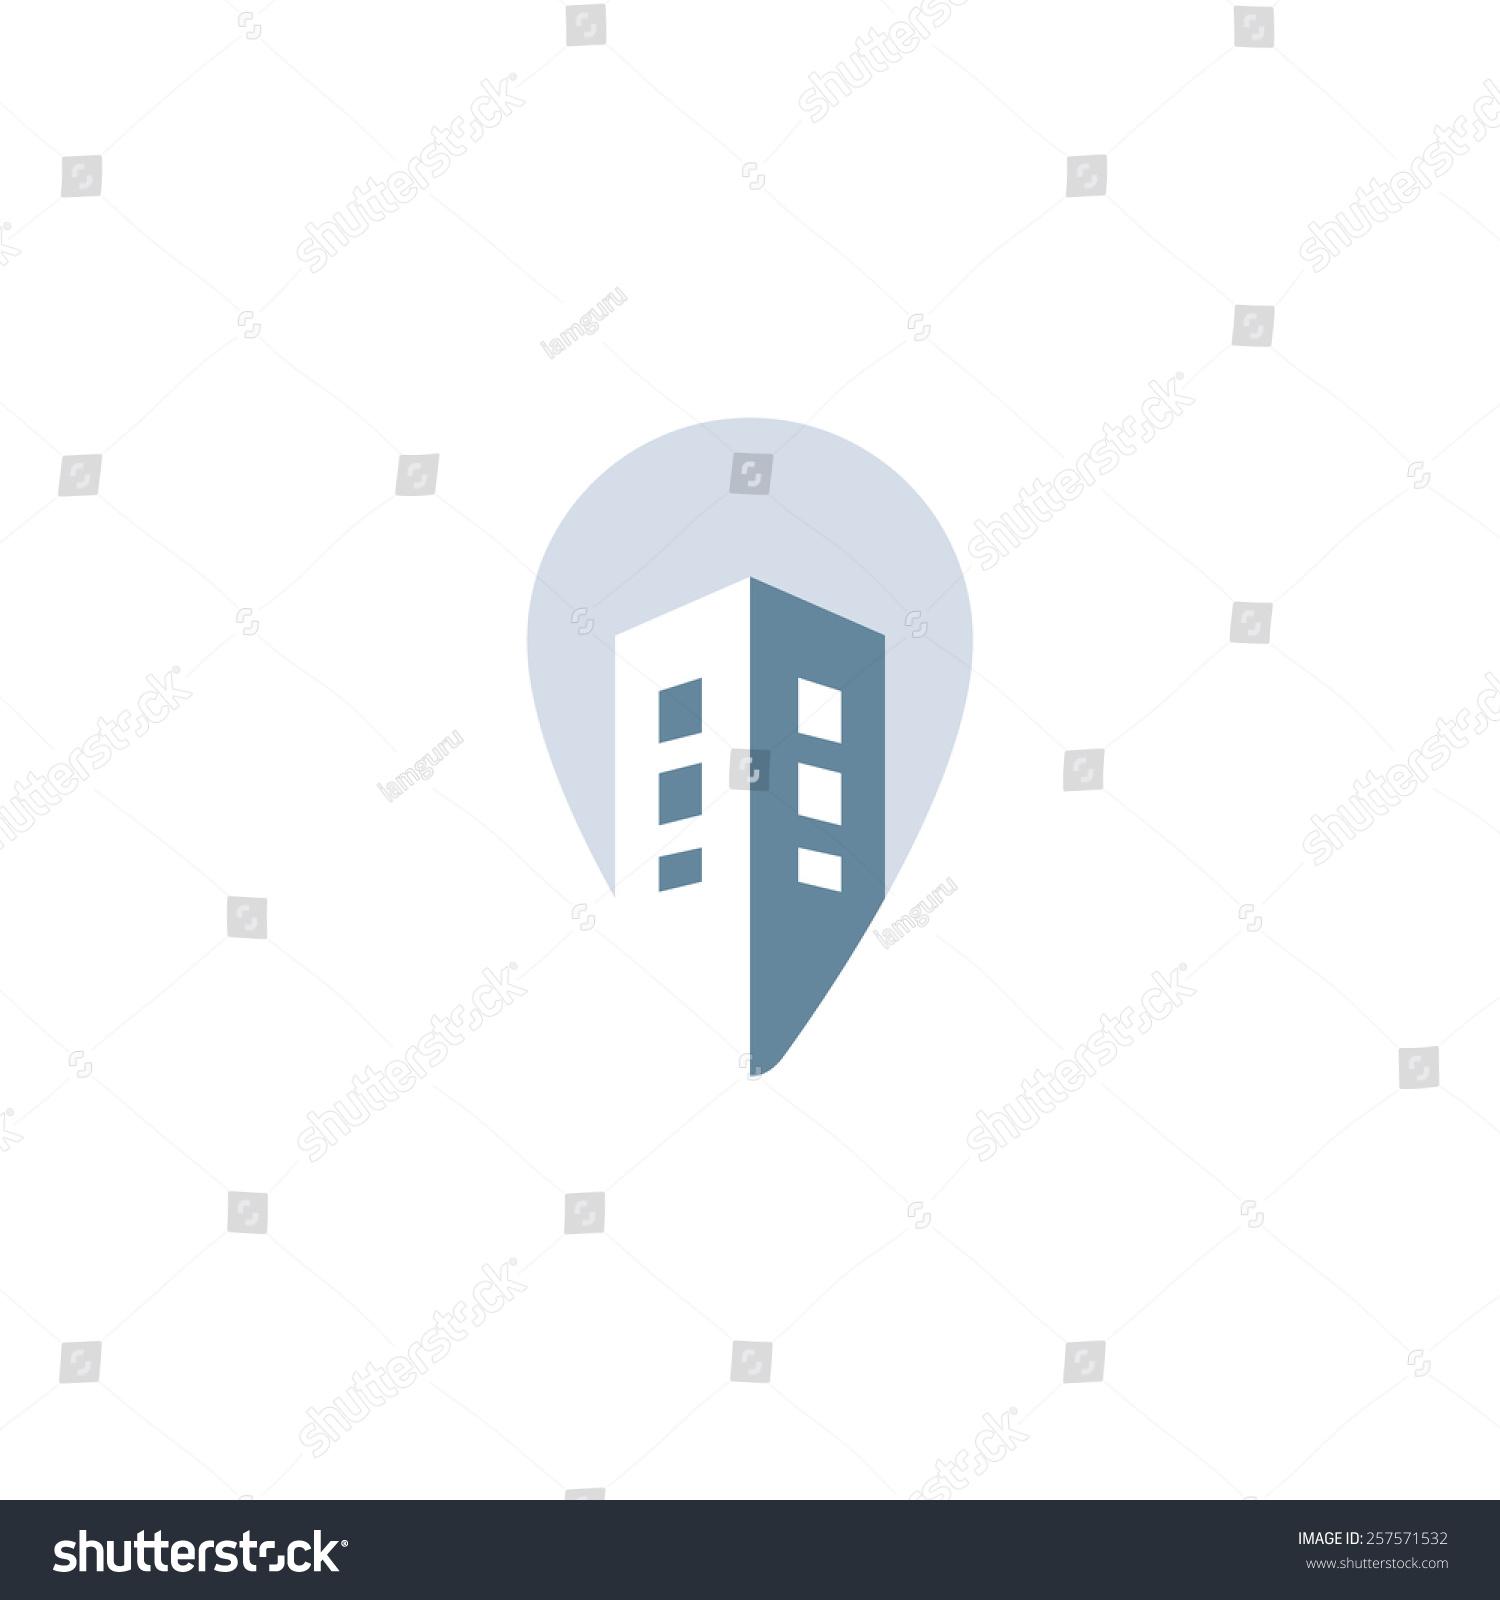 Real Estate Development Icon : Pin house vector concept construction development stock